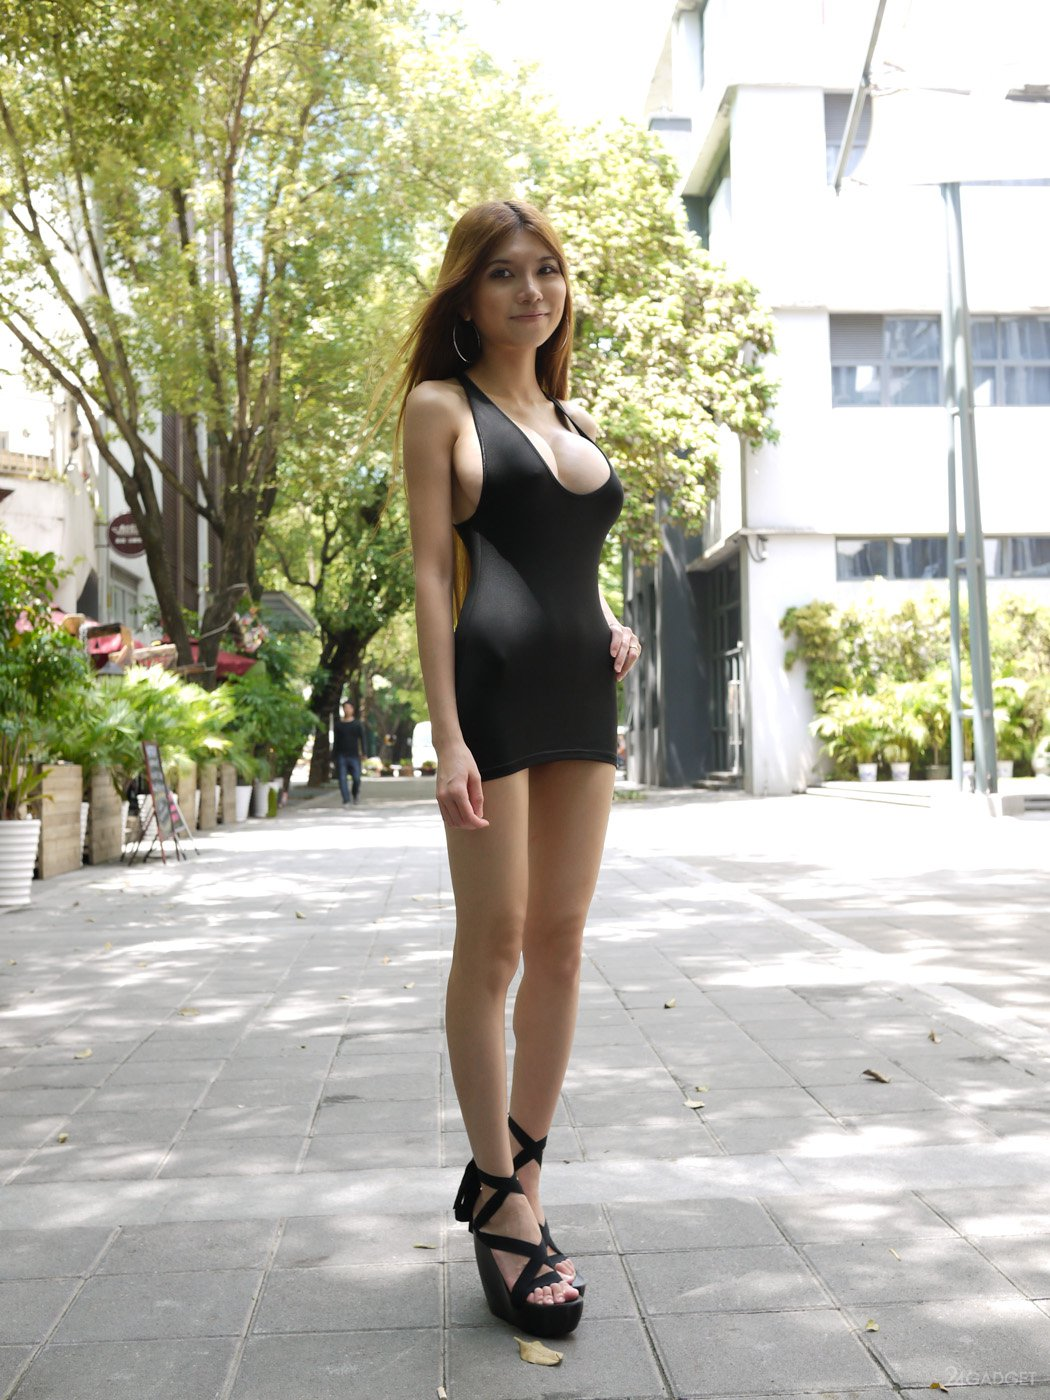 Порно короткая юбка на улице видео съемка порно